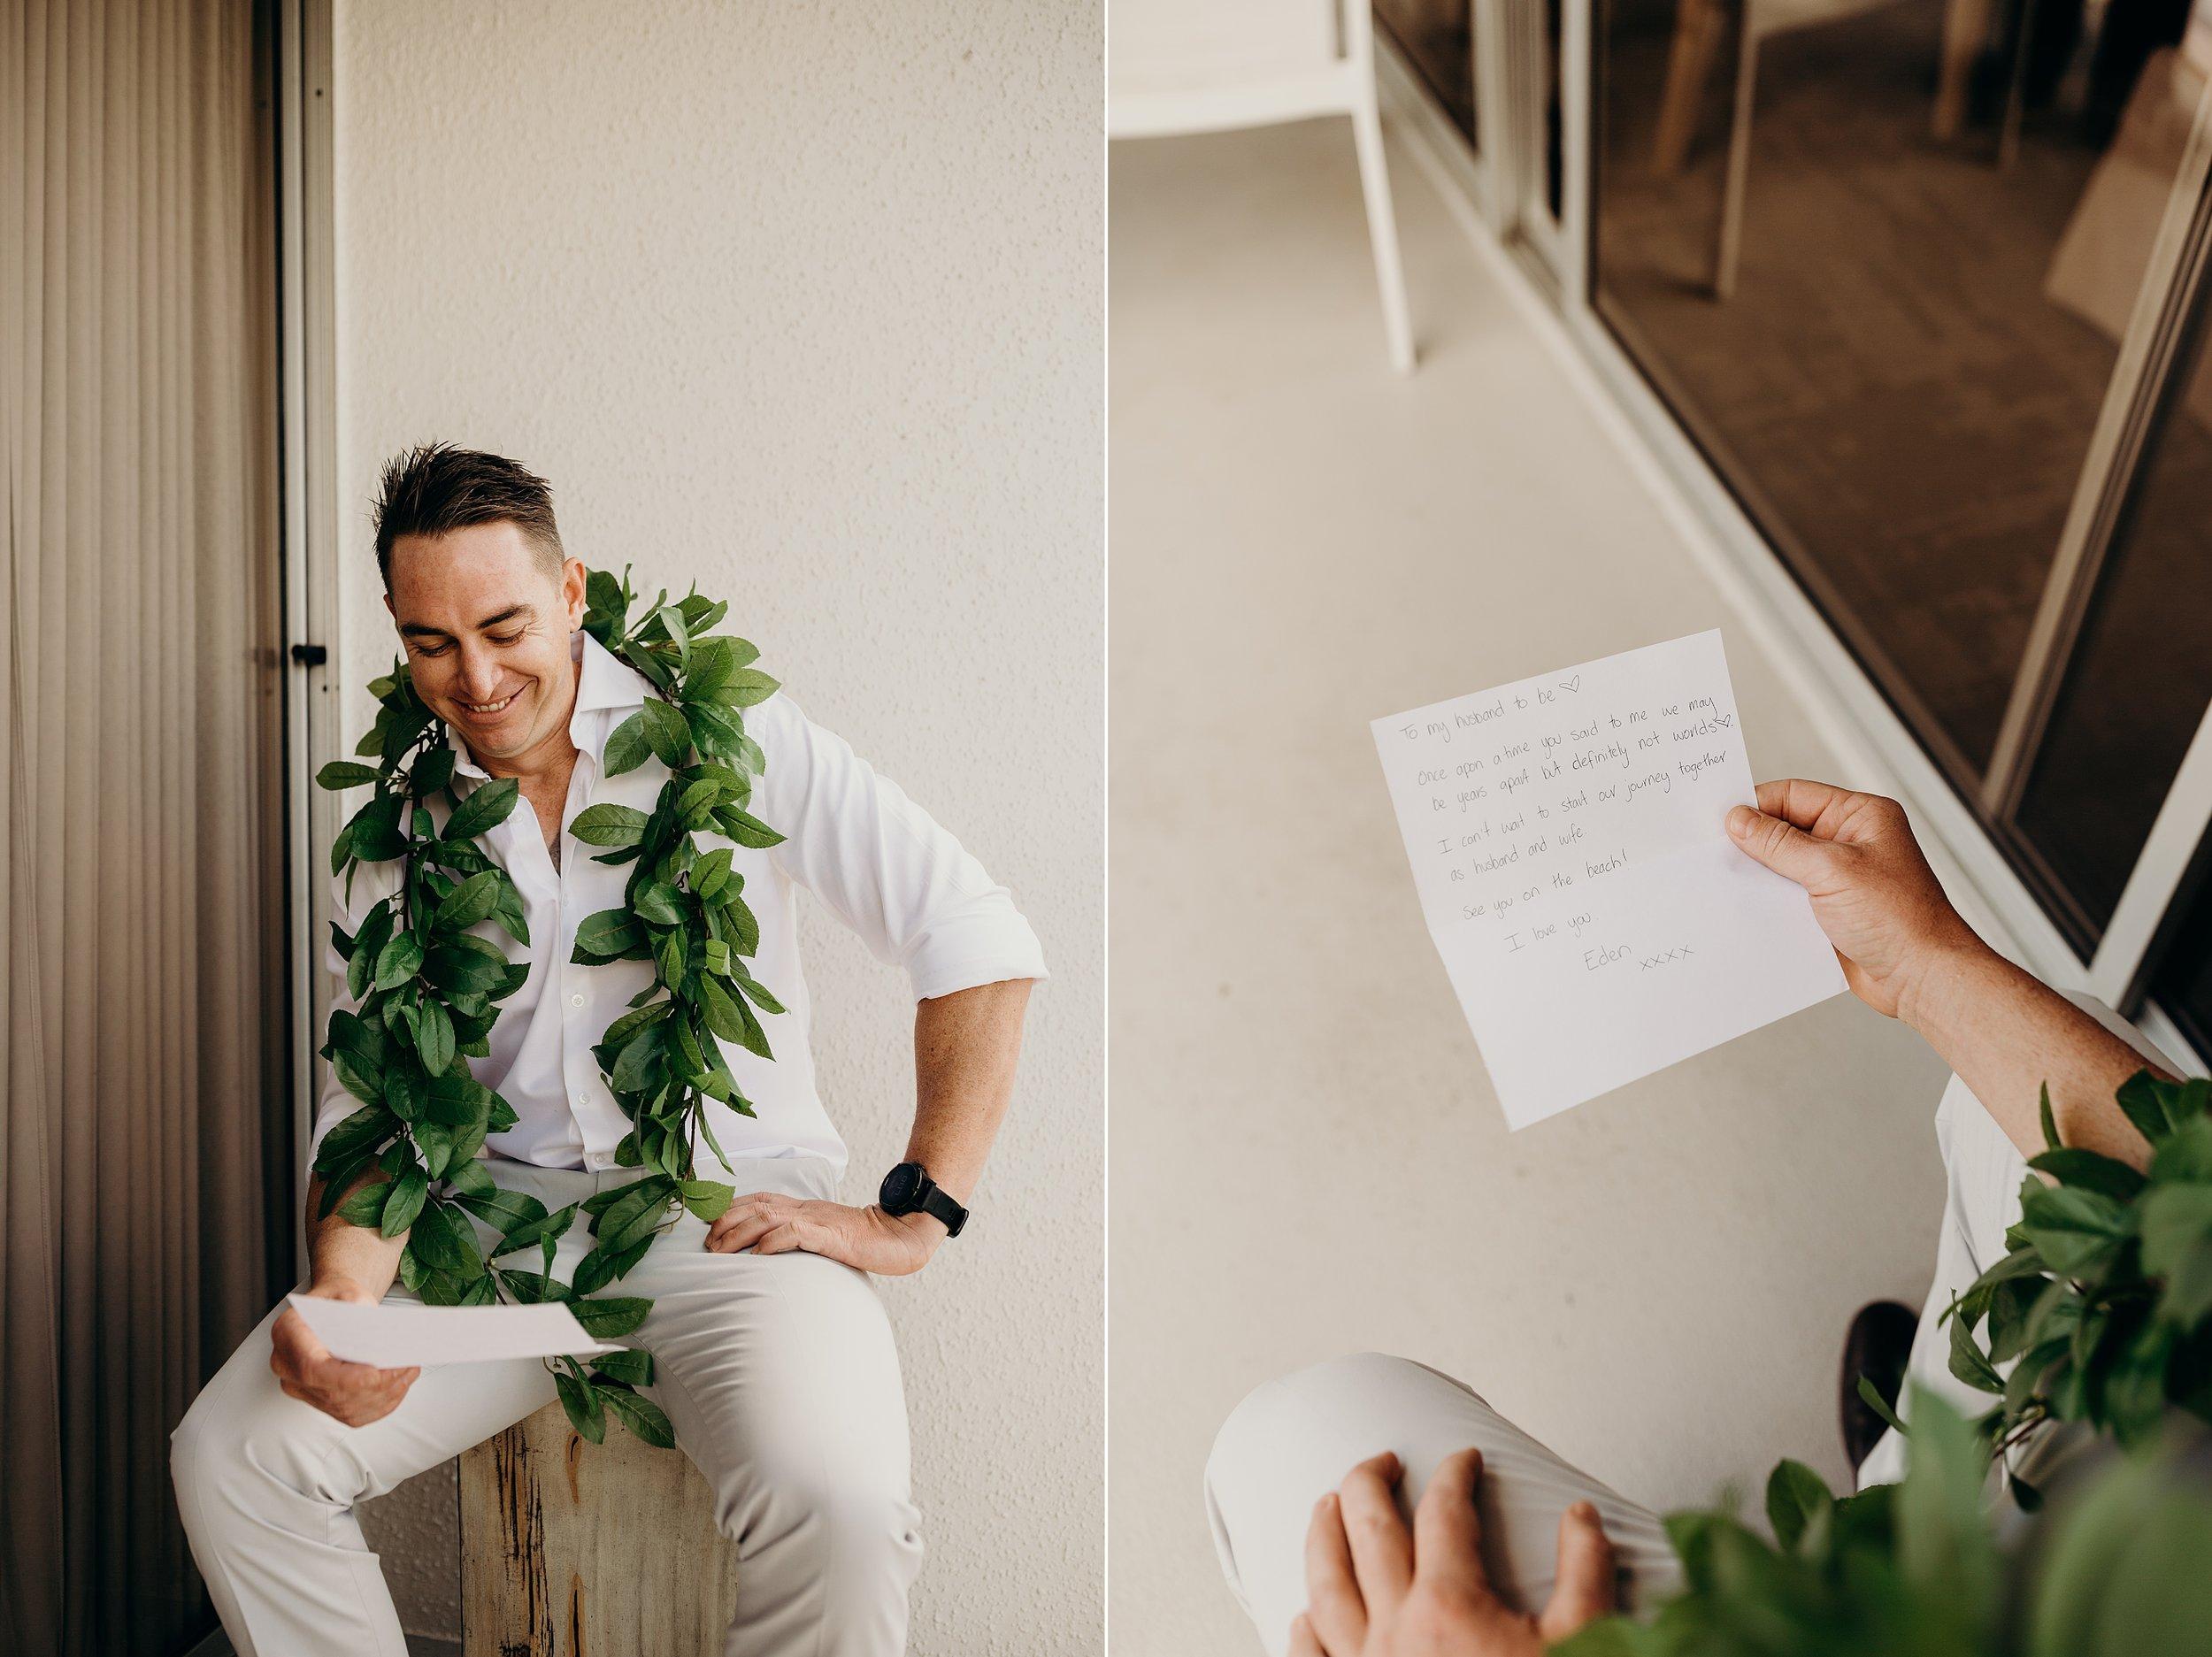 HAWAII-WEDDING-PHOTOGRAPHER-ALOHILANI-RESORT-KEANI-BAKULA_0006.jpg